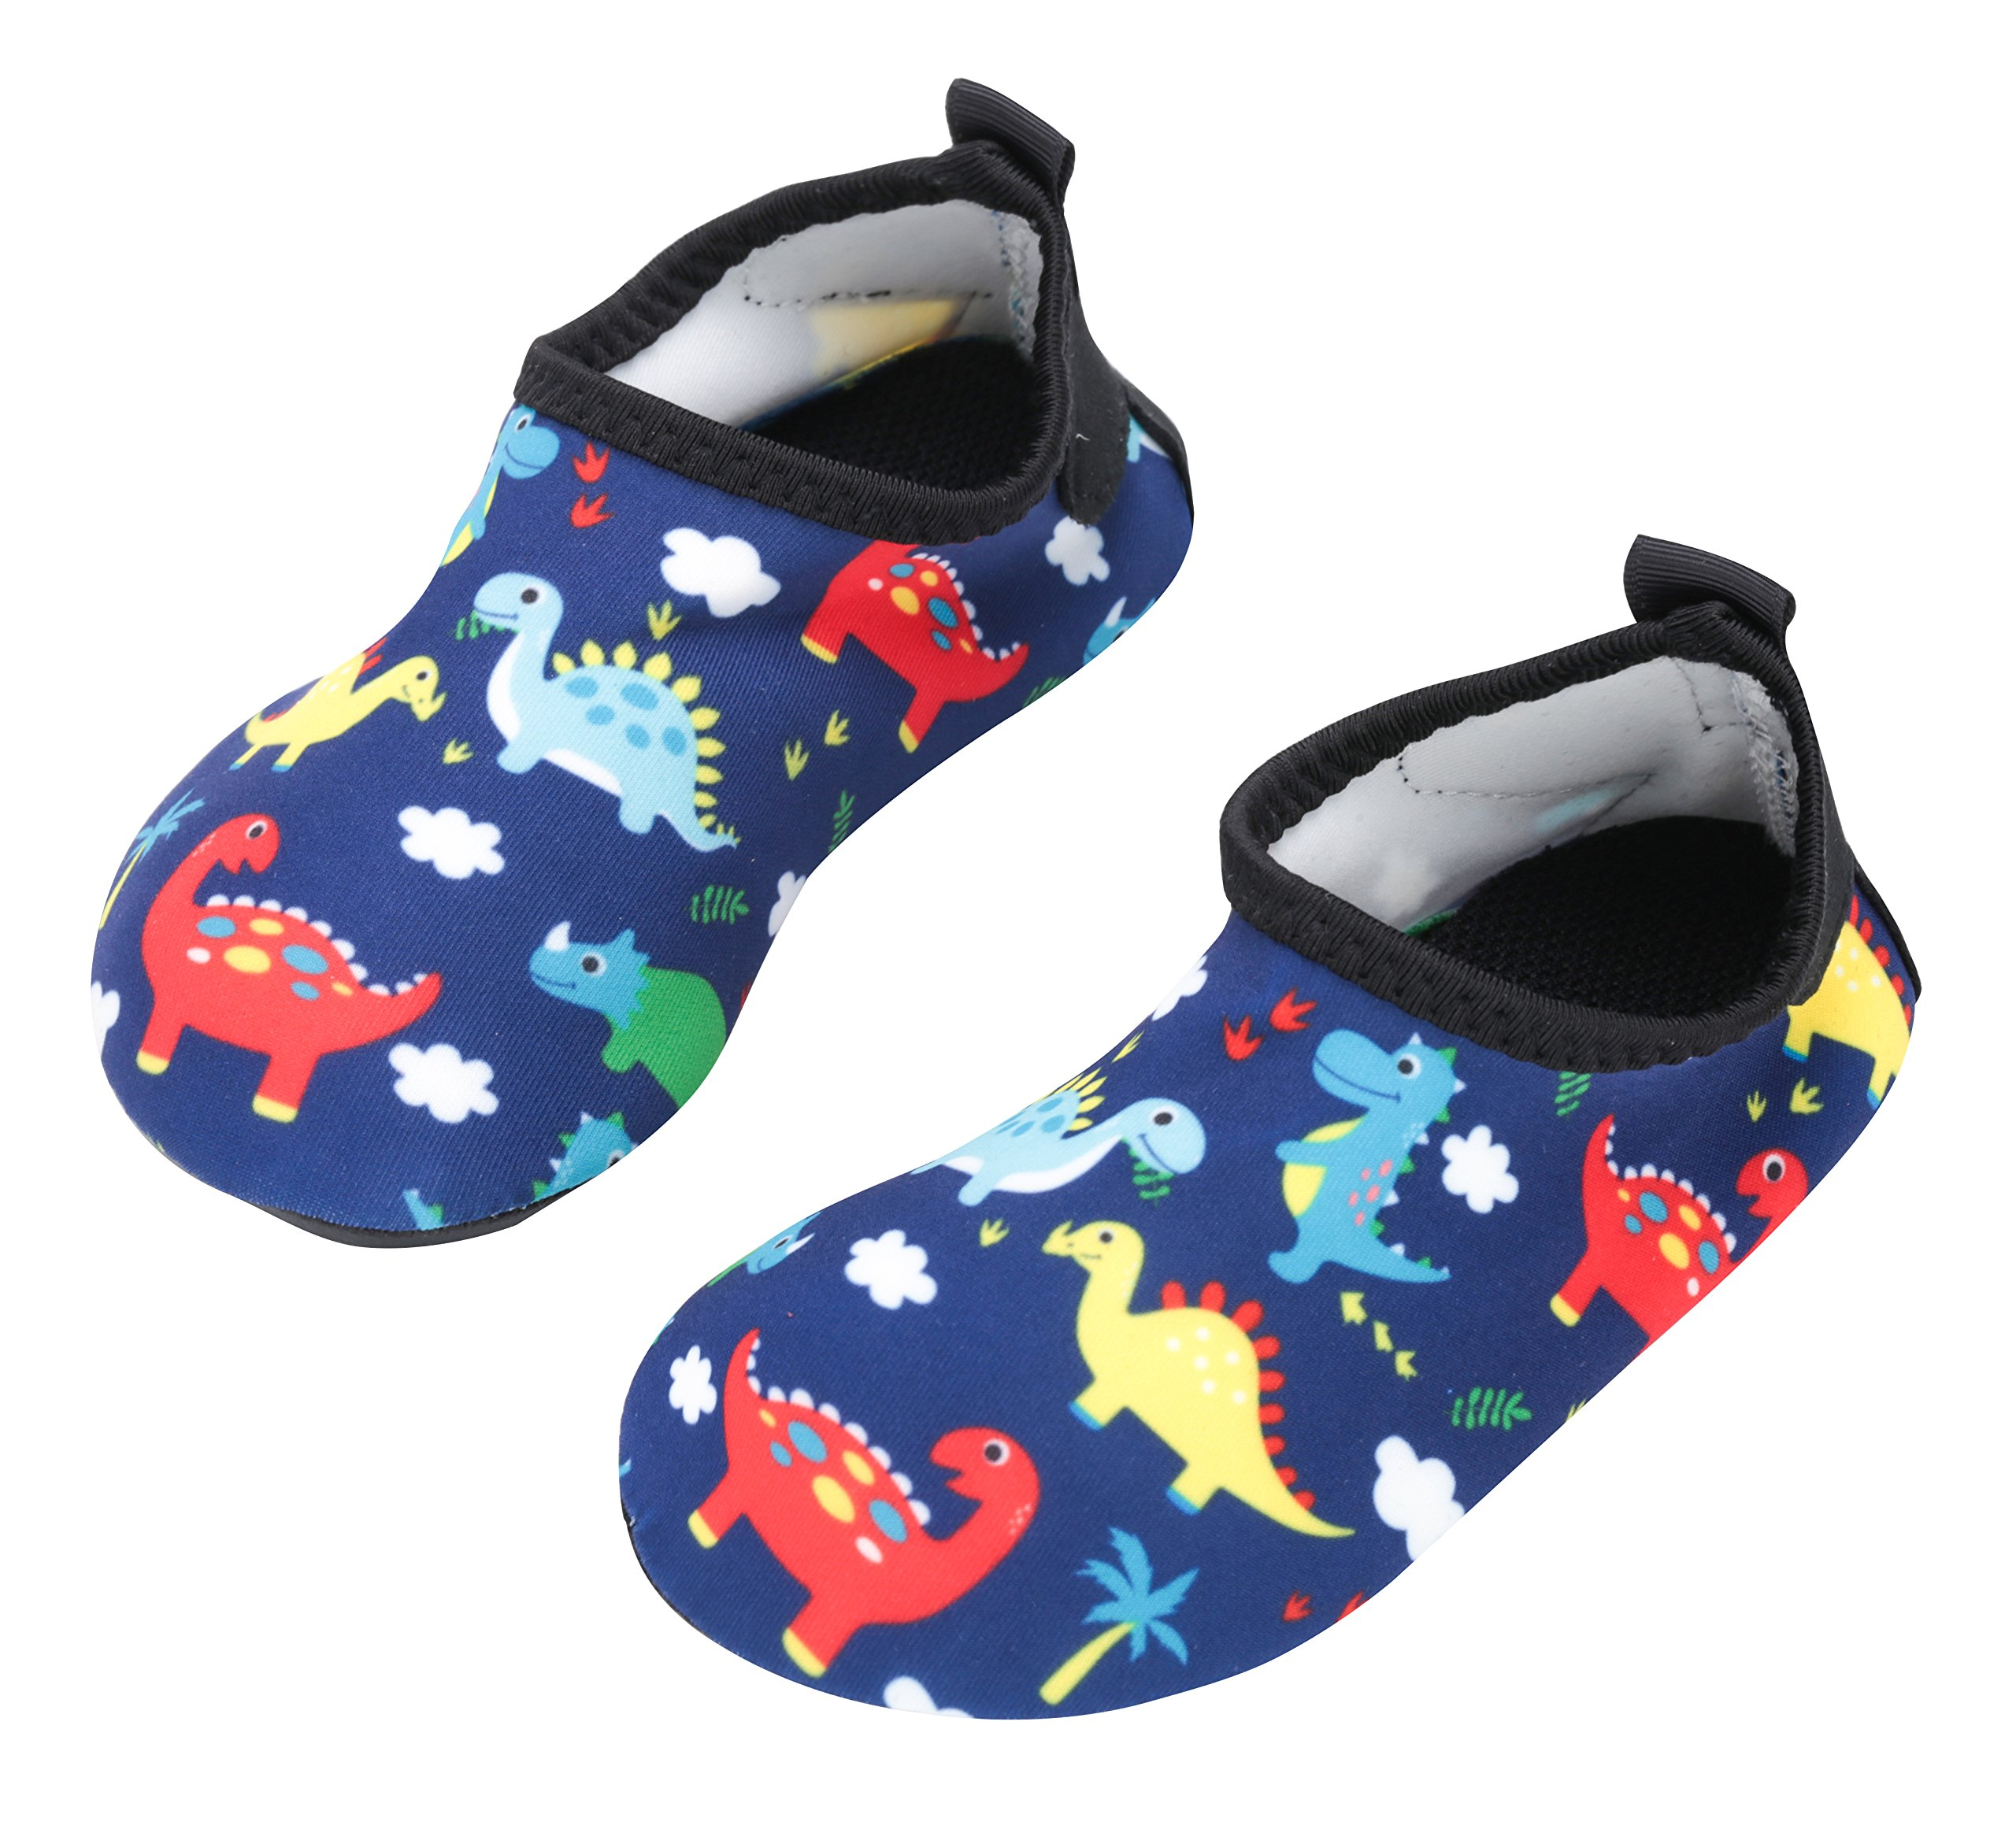 Toddler Boys Water Shoes Babys Skin Swim Shoes Child Quick Drying Barefoot Aqua Socks for Girls Pool Beach Lightweight Dinosaur Summer HDKL 26-27